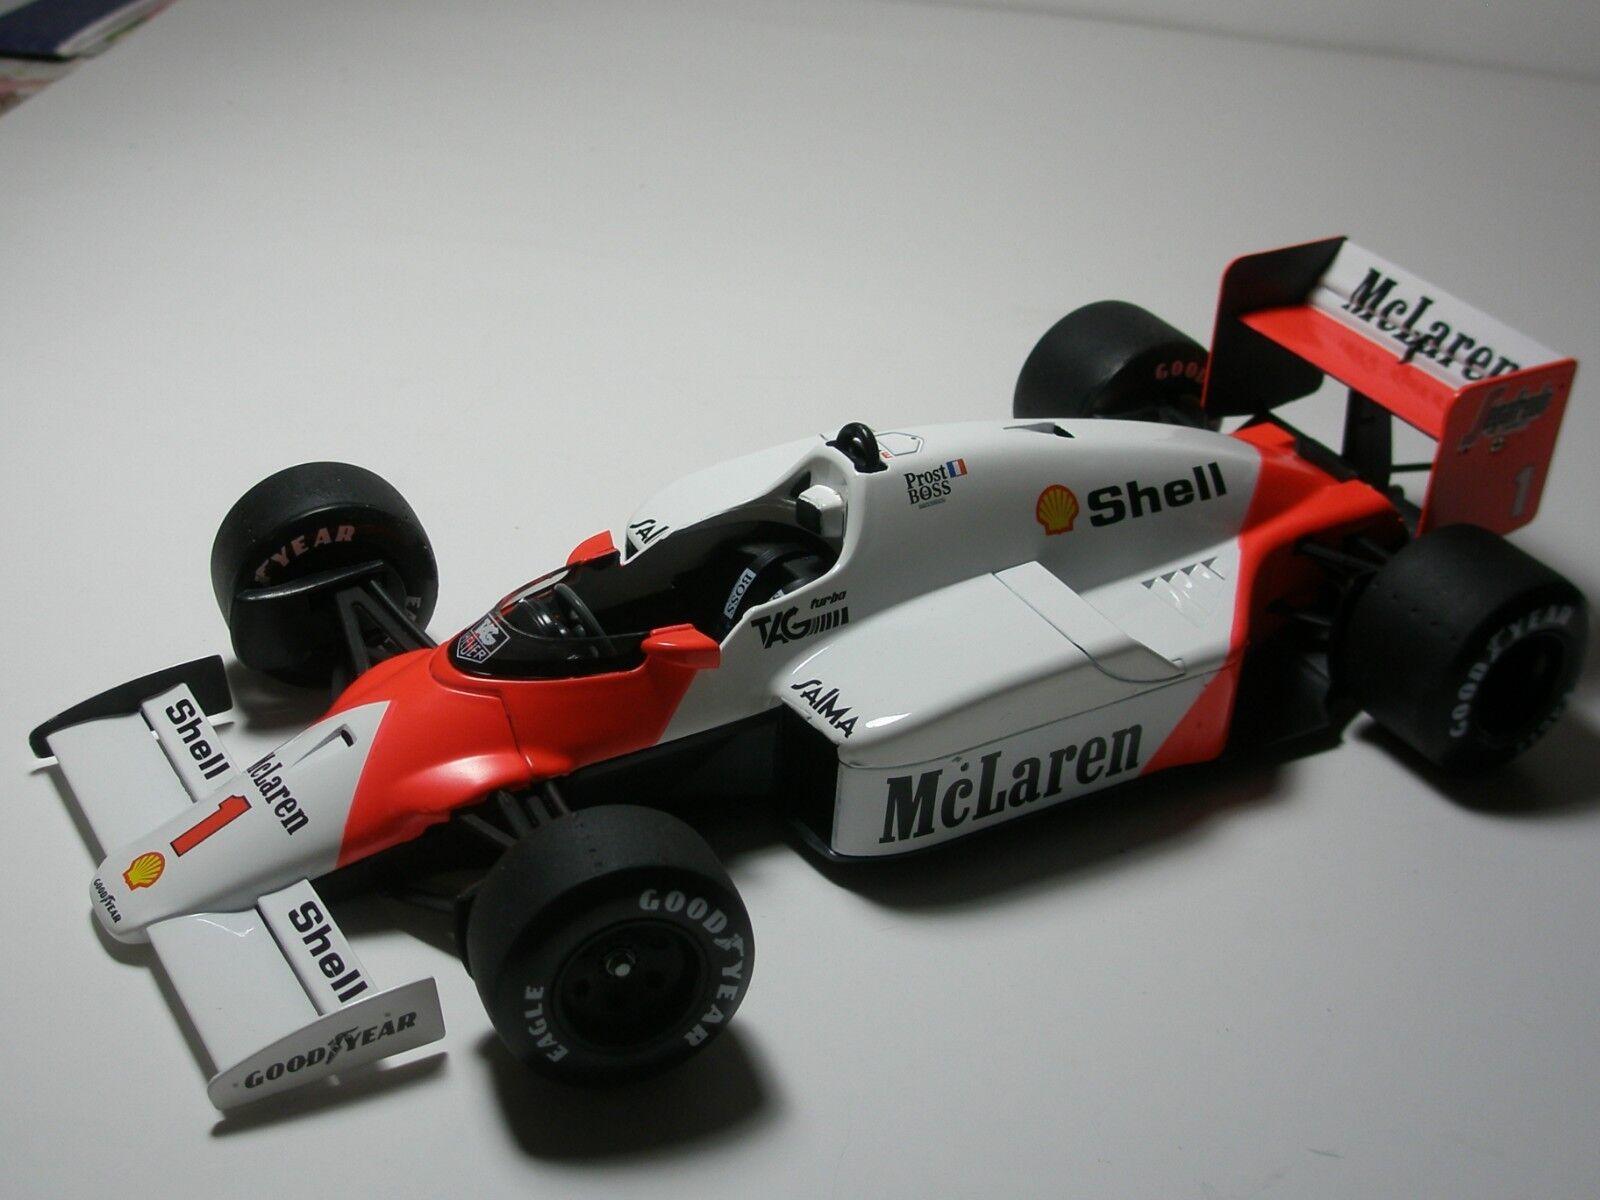 1 18 F1 McLaren Alain Prost, World Champion 1986. Solido